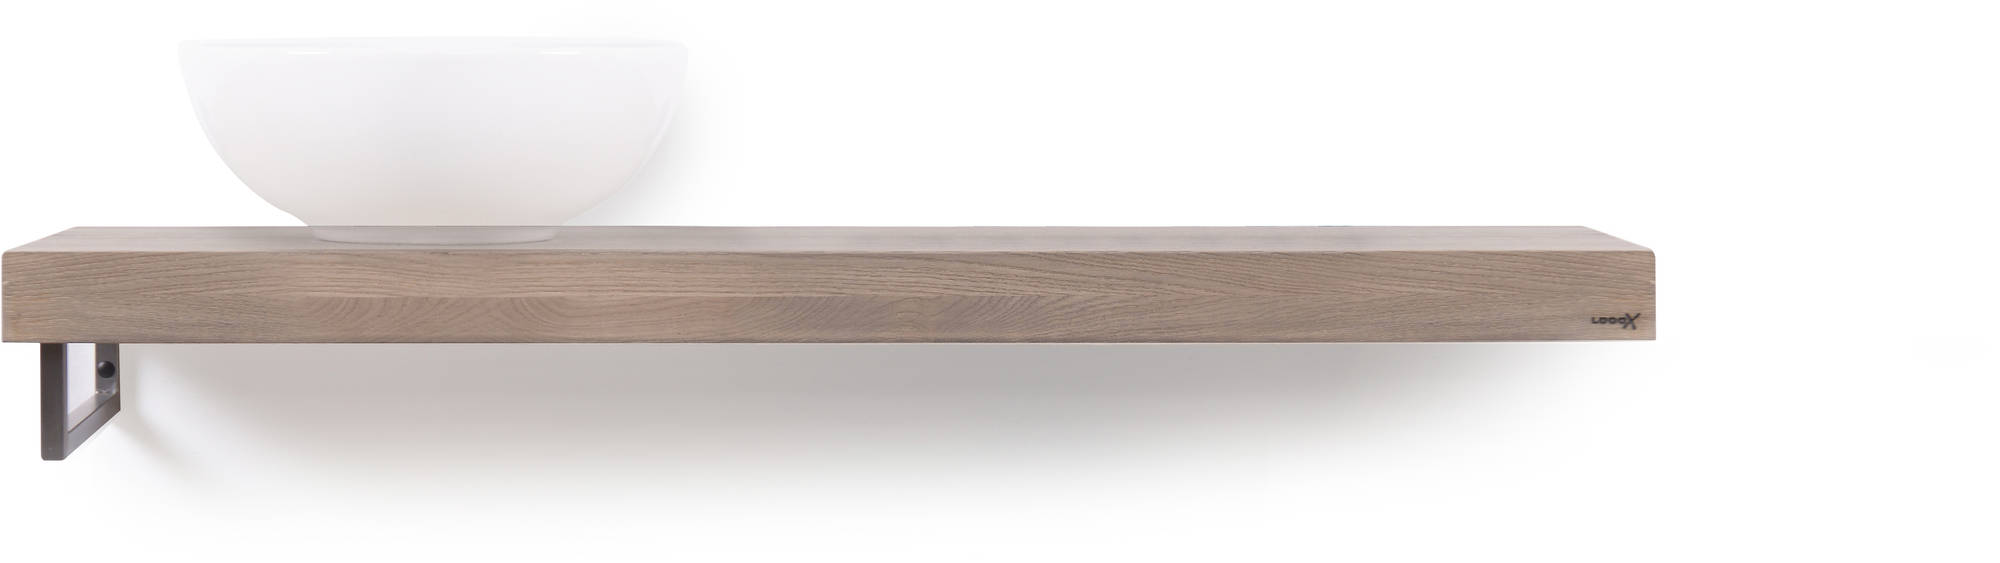 Looox Wooden Base Shelf Solo 120 cm Houder Links Old Grey/RVS